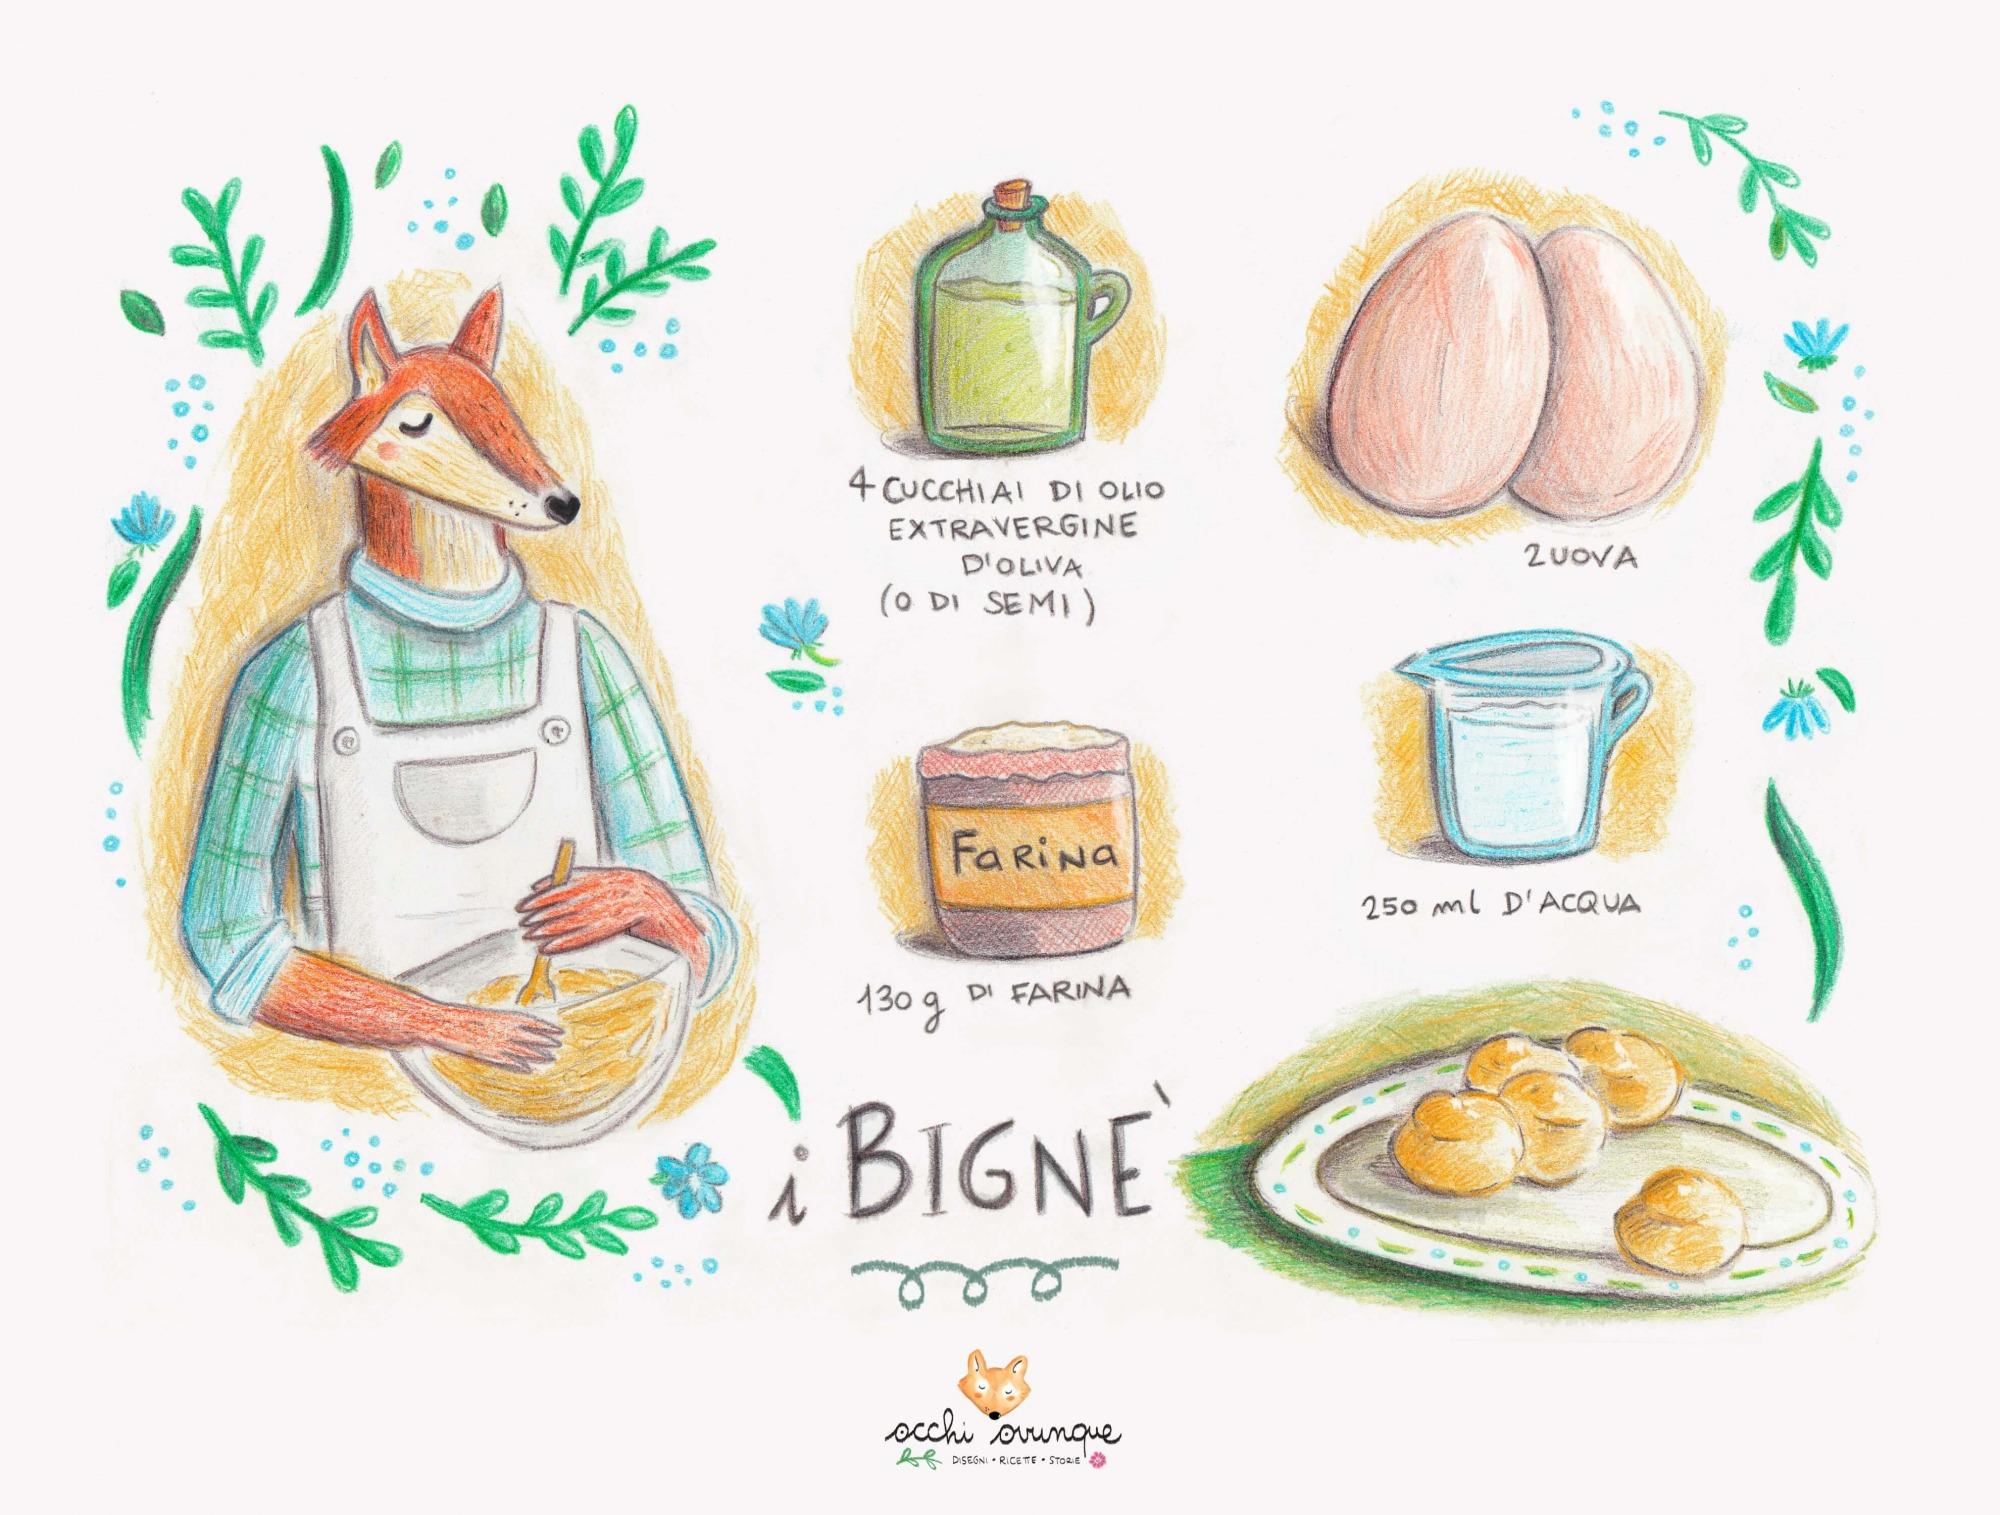 bignè pasta choux